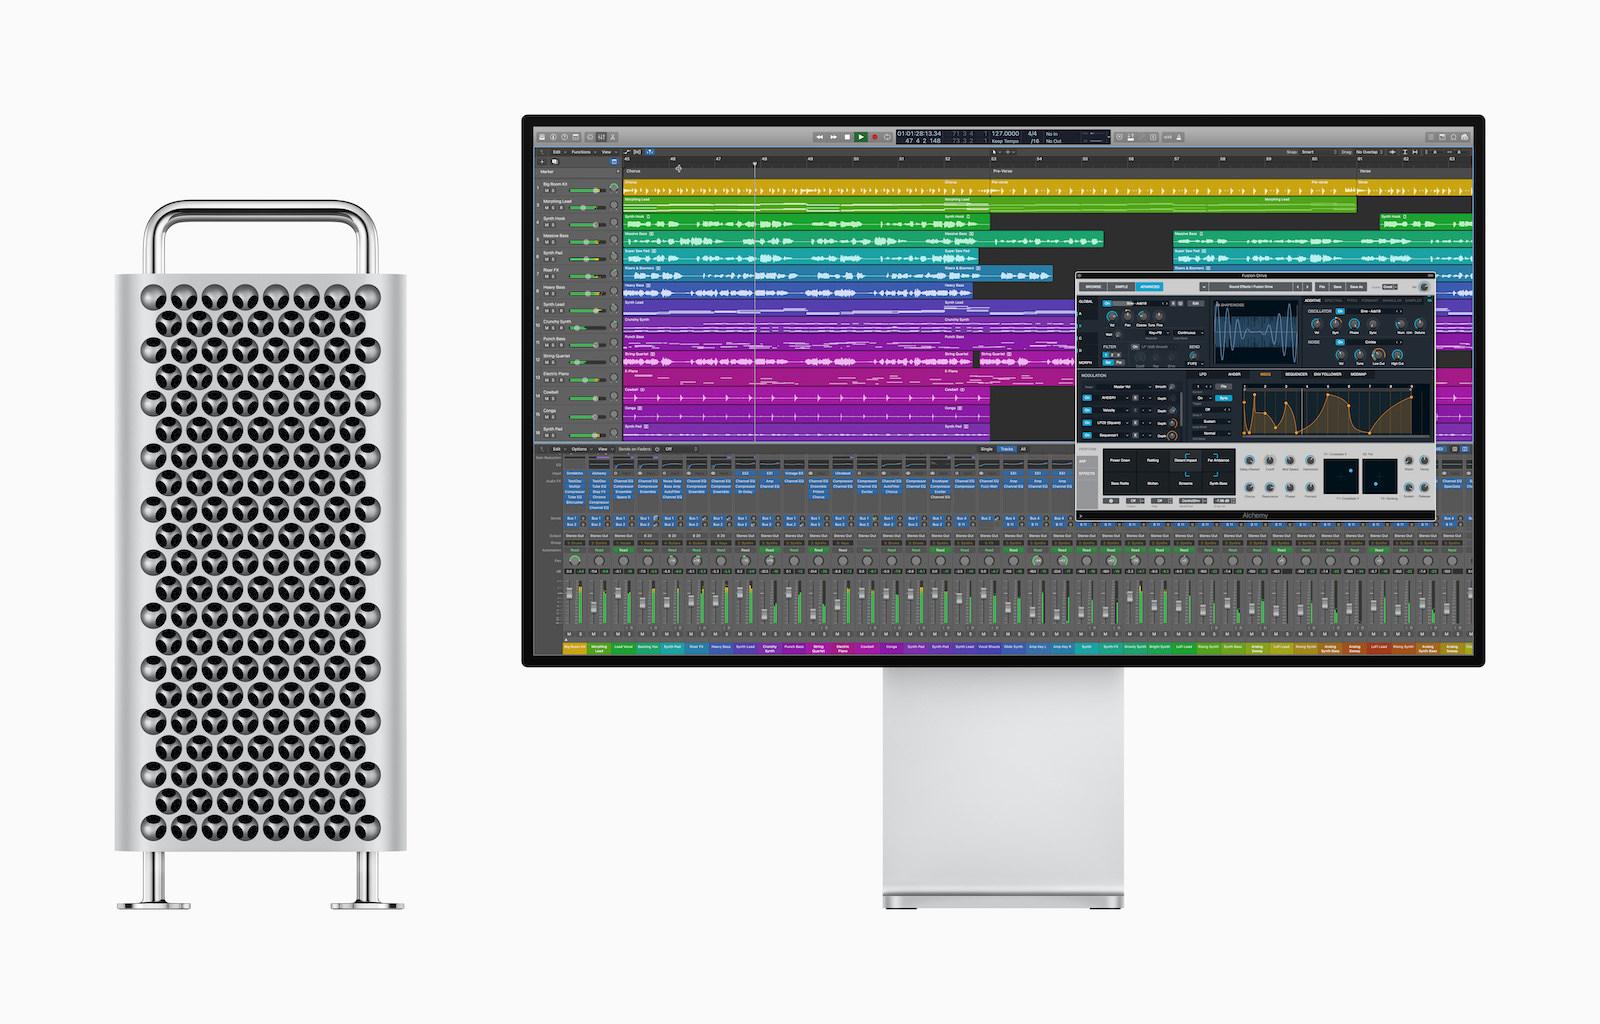 Apple_Logic-Pro-X_Mac-Pro-Display-Pro_06132019.jpg